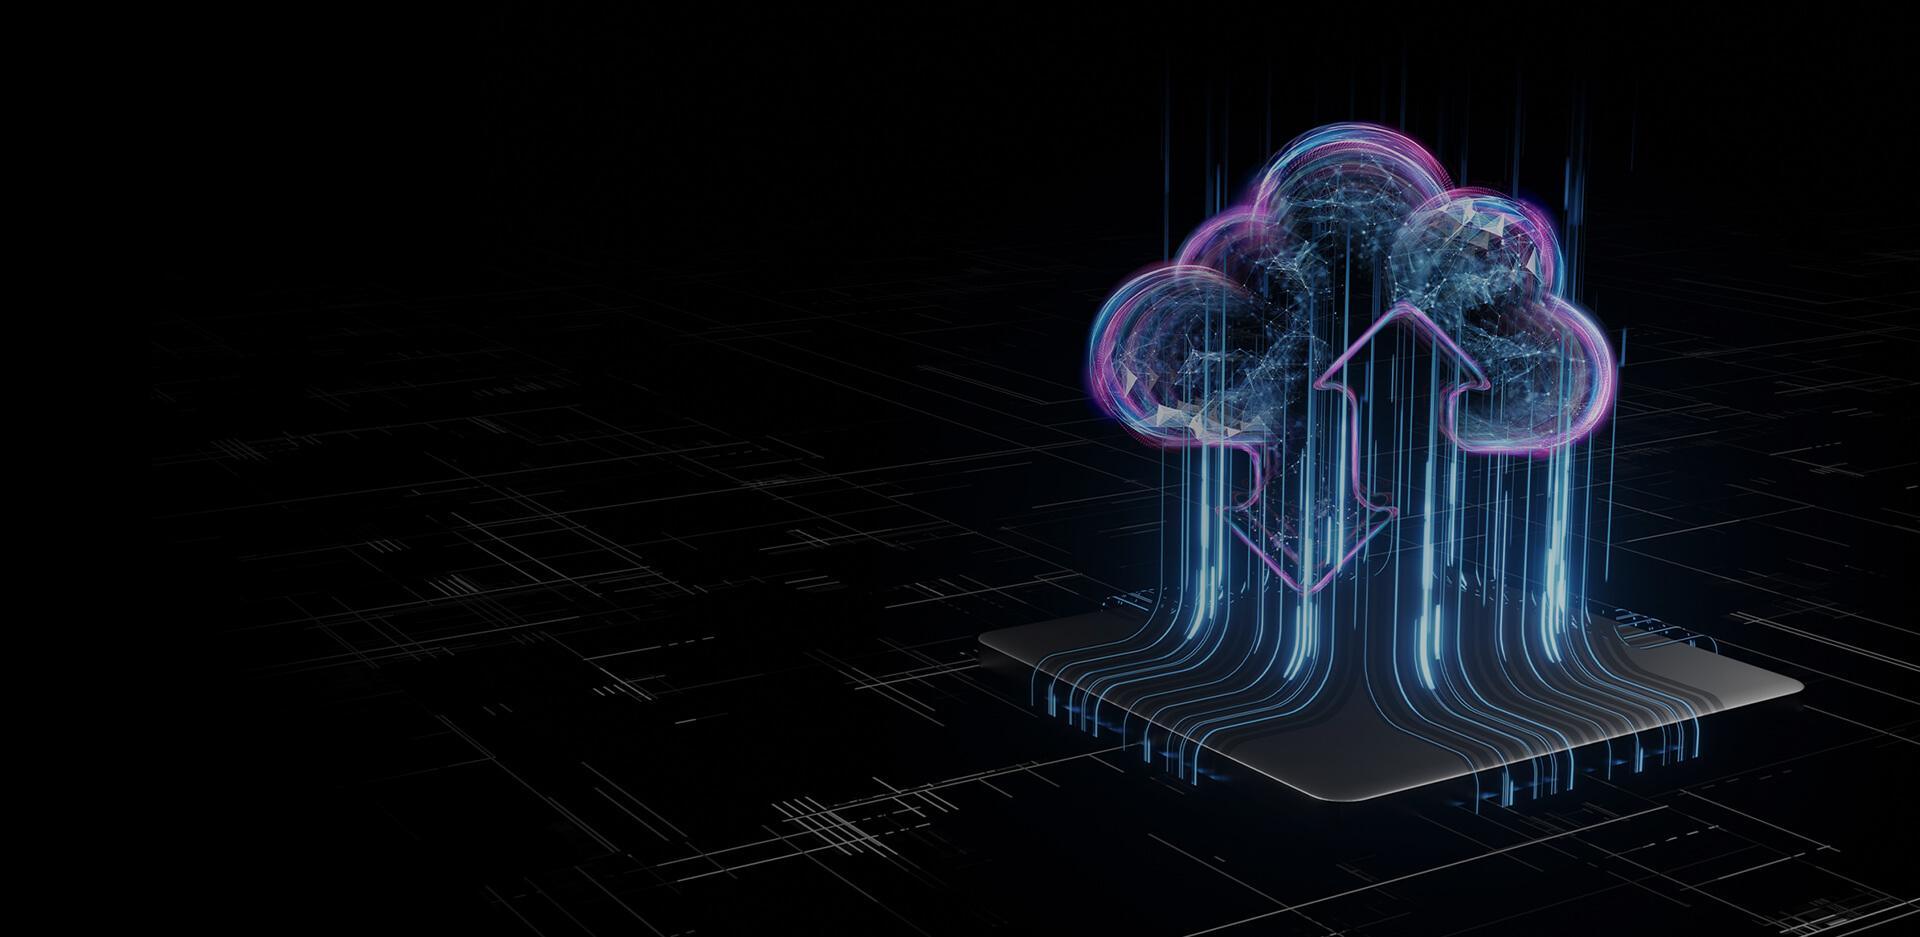 Cloud-hosting enables breakthrough website access